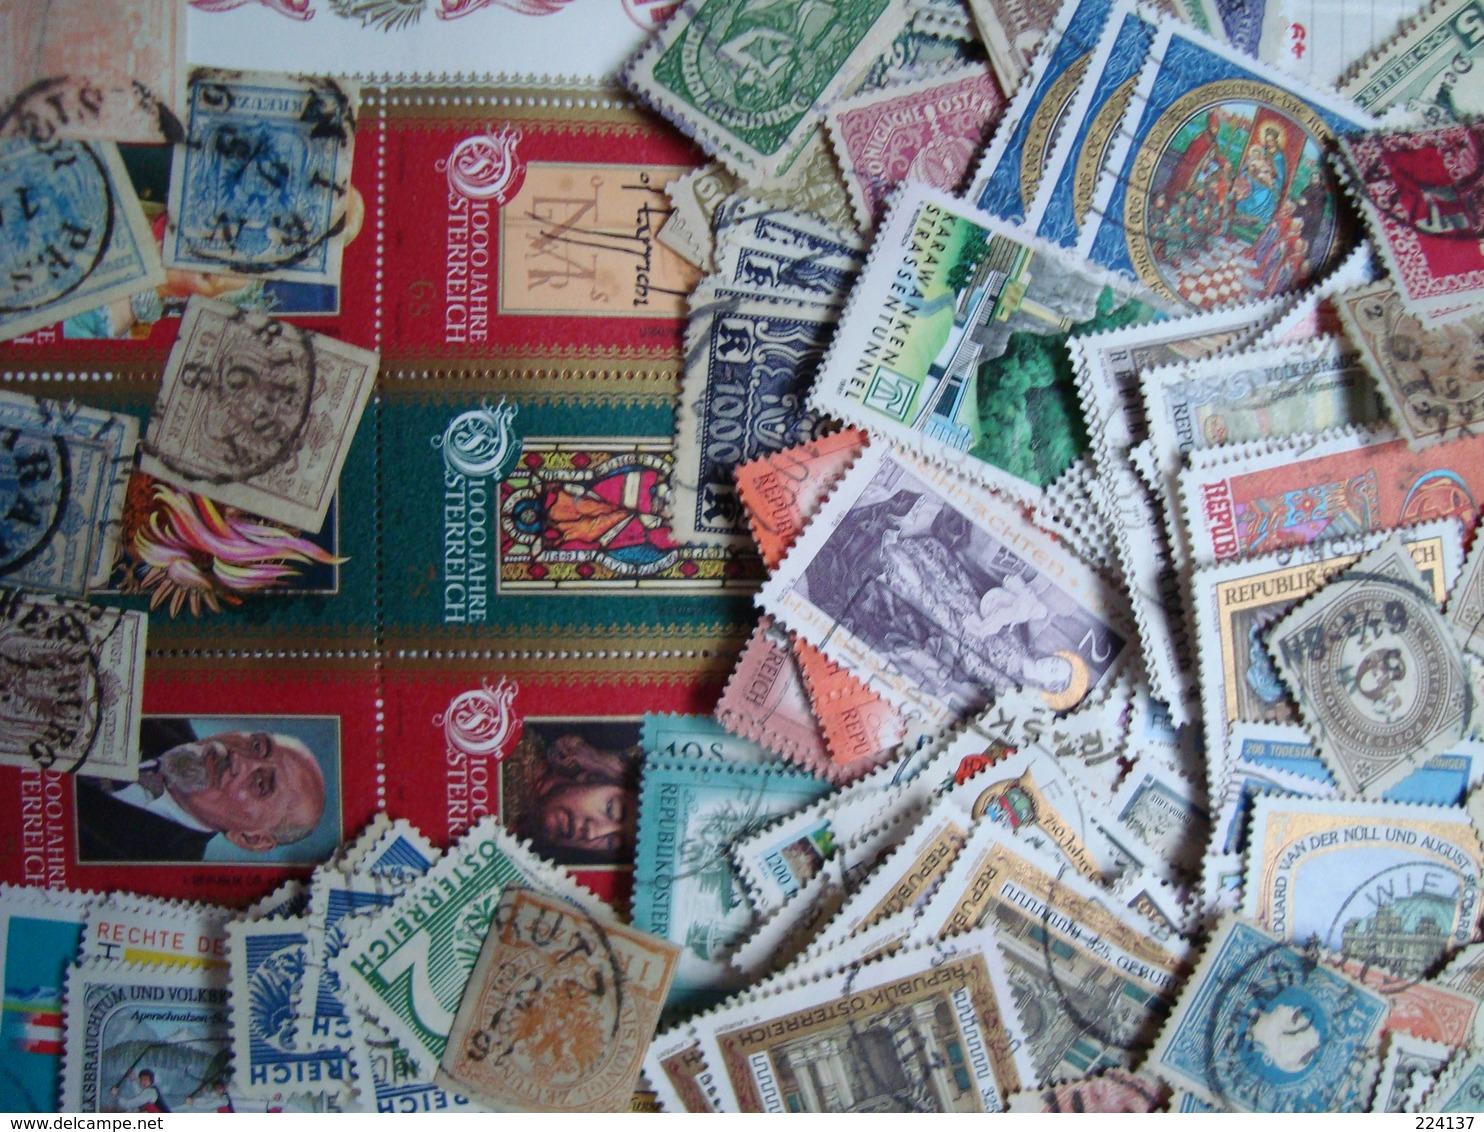 VRAC AUTRICHE + SATELLITES 290 G + 50G - Stamps